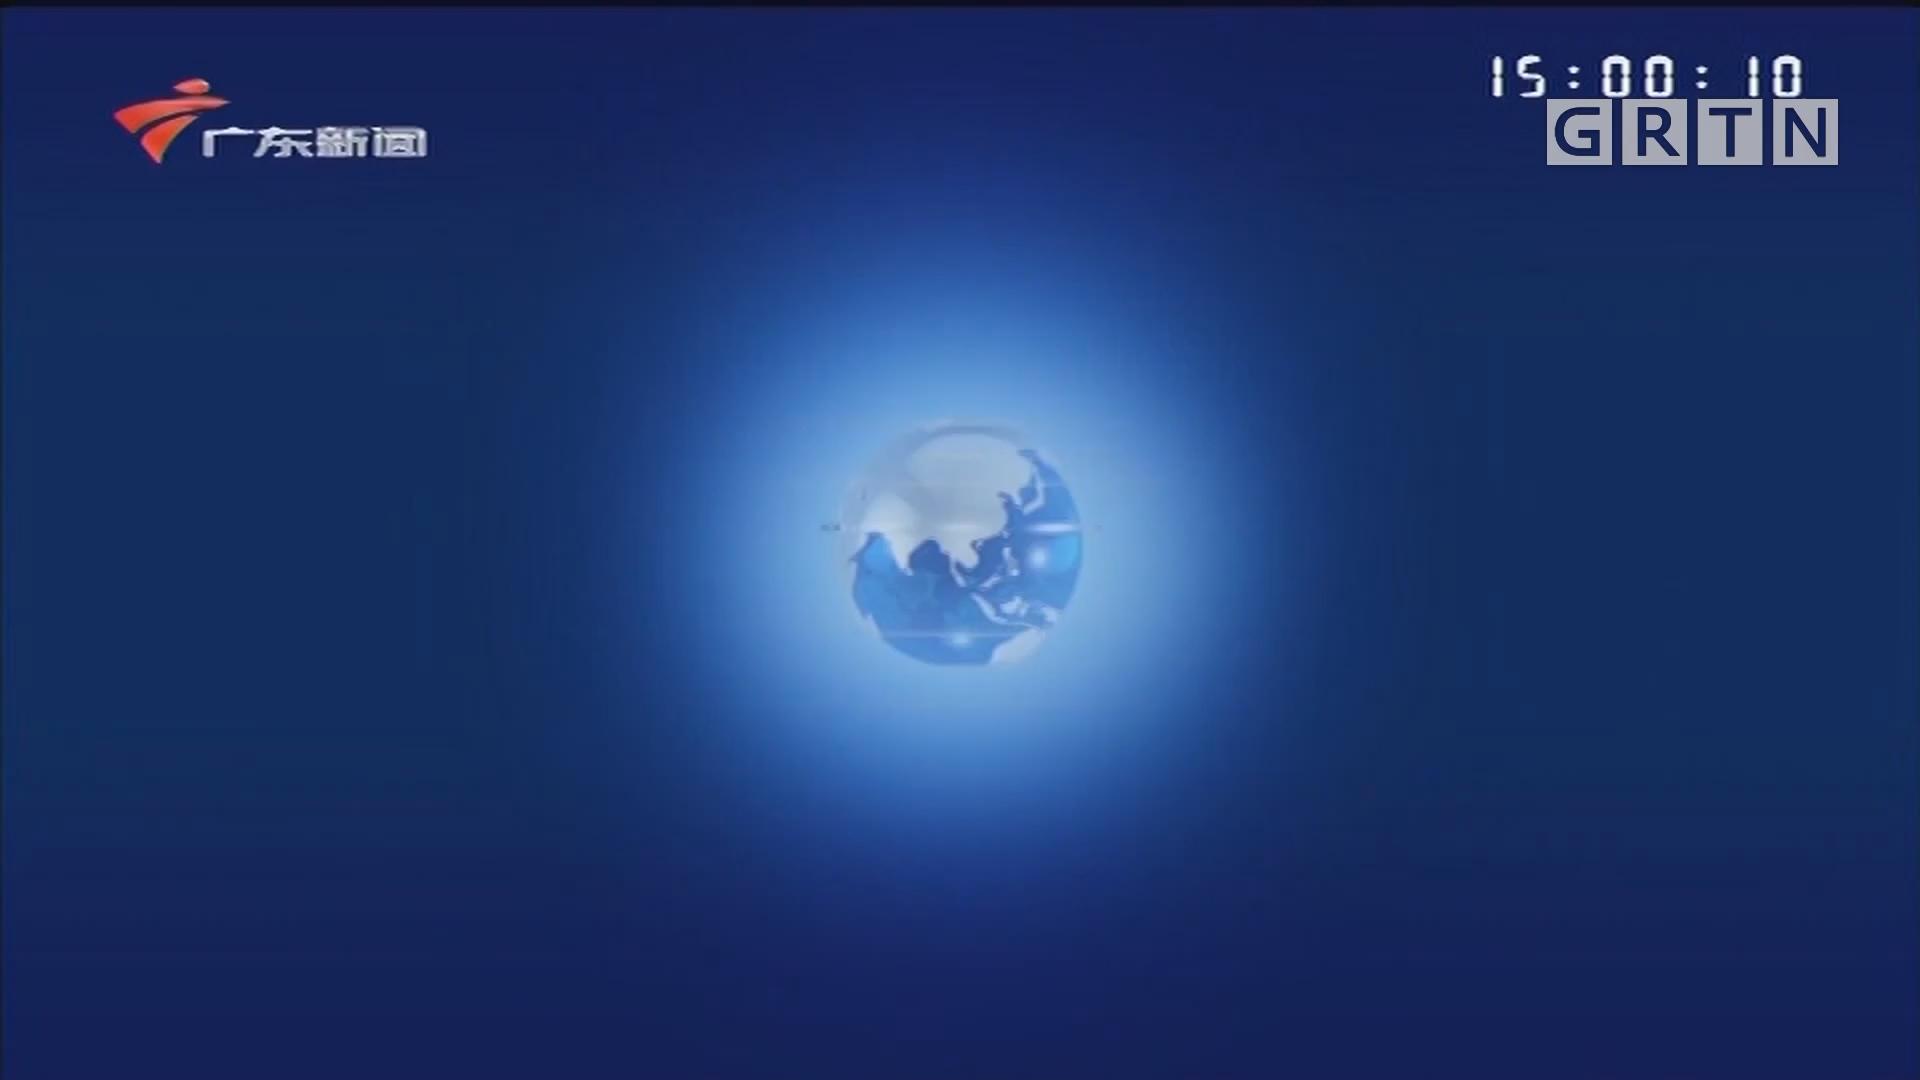 [HD][2020-02-27-15:00]正点播报:刑释确诊人员离汉抵京 应勇:不论涉及到谁 一查到底!